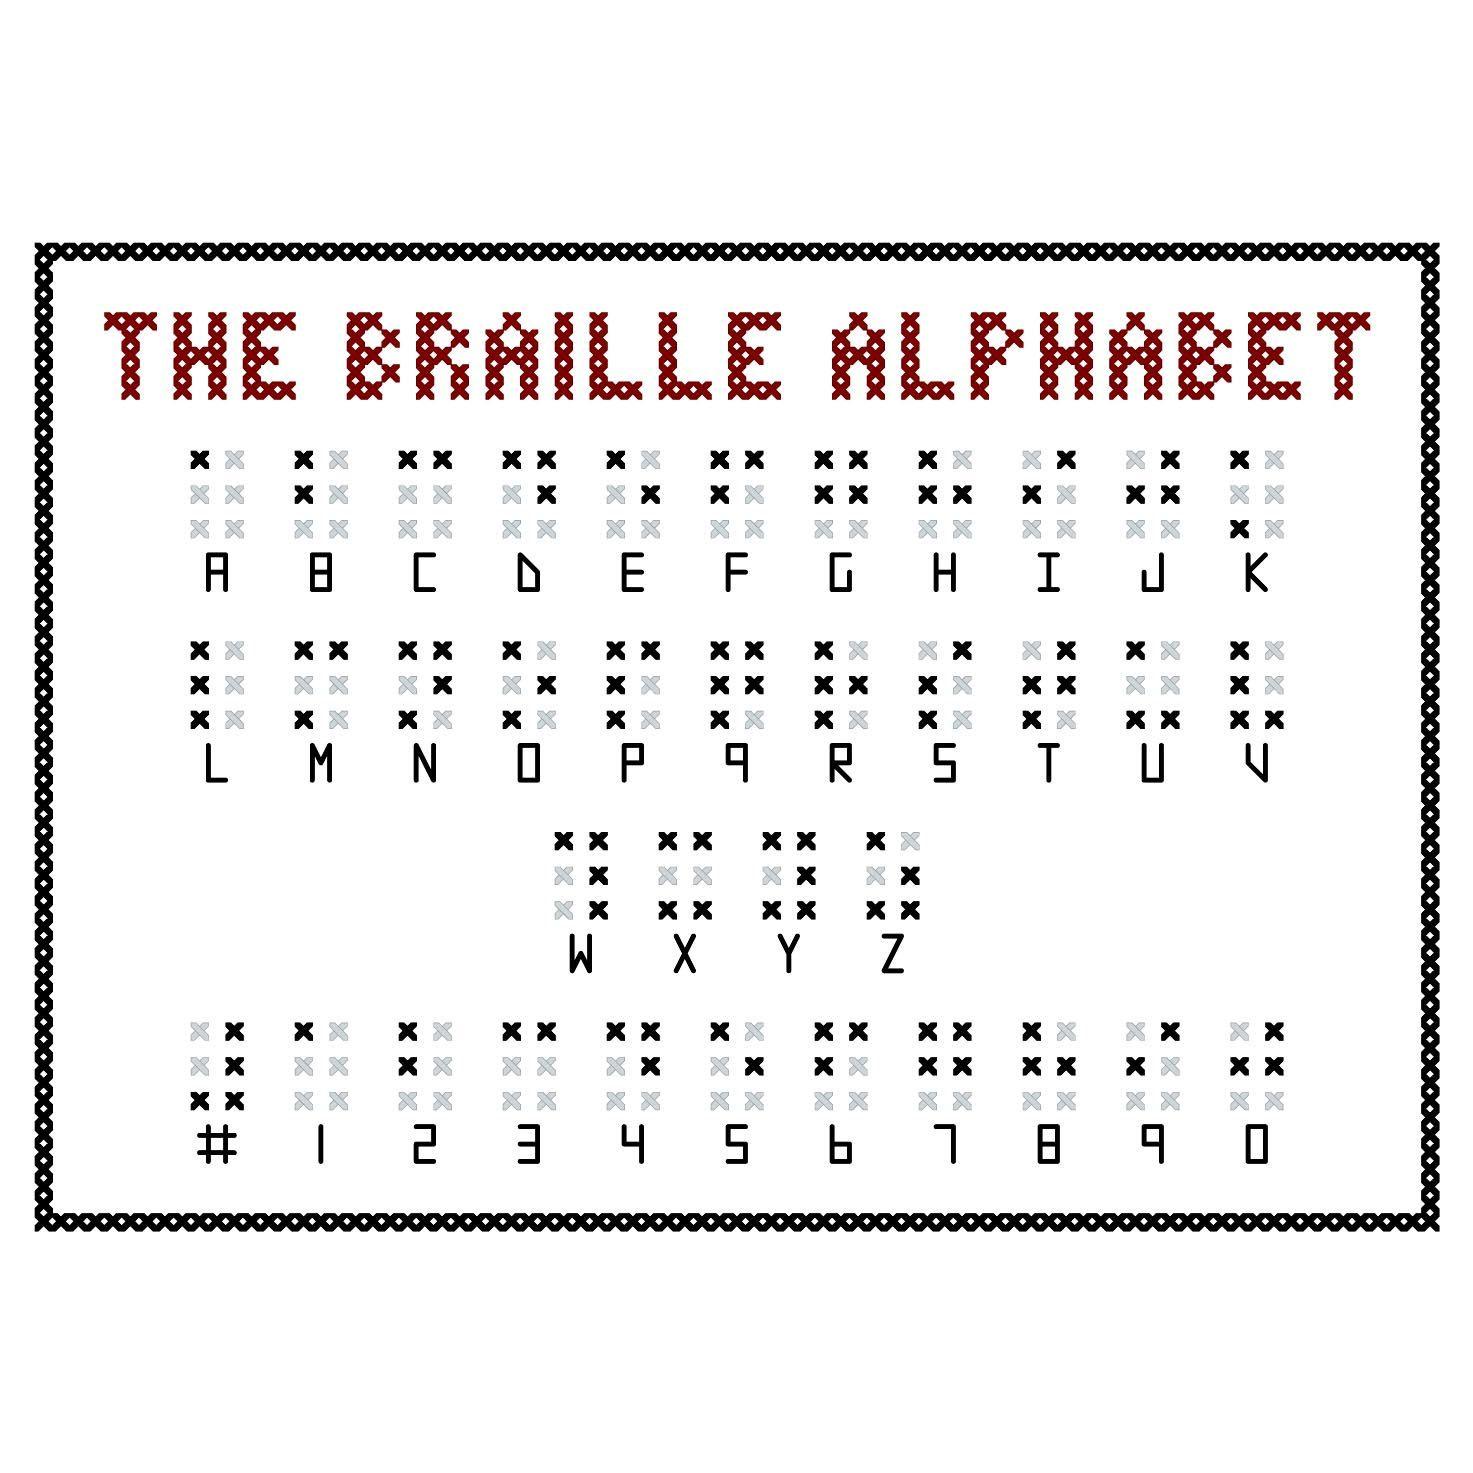 BRAILLE ALPHABET Cross Stitch Sampler Pattern. $5.00, via